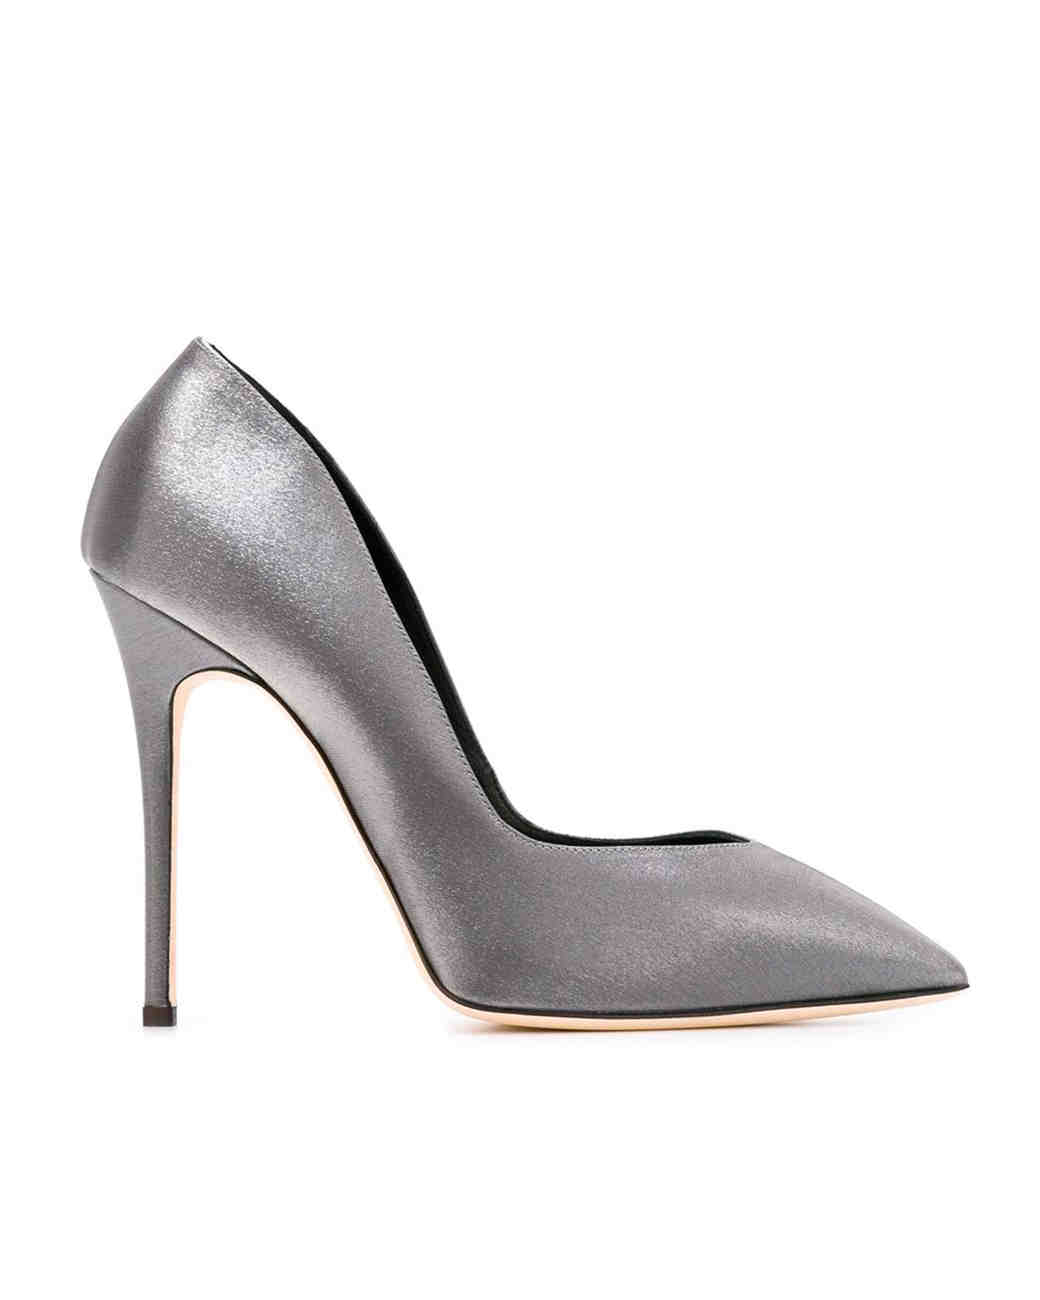 closed-toe-wedding-shoes-giuseppe-zanotti-farfetch-1215.jpg